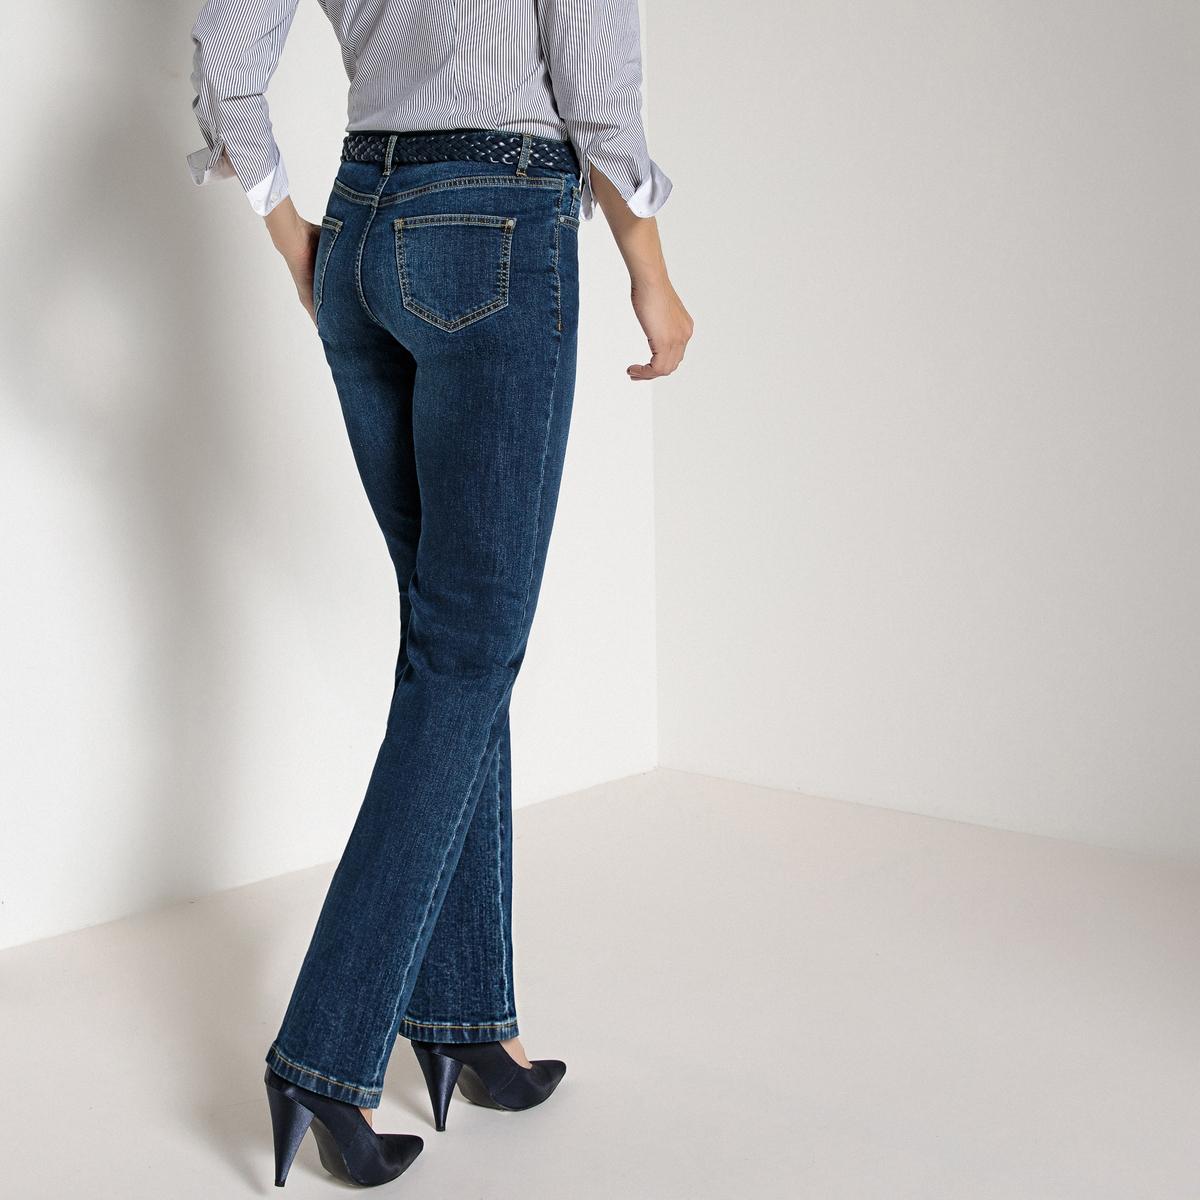 Jeans bootcut, ganga stretch